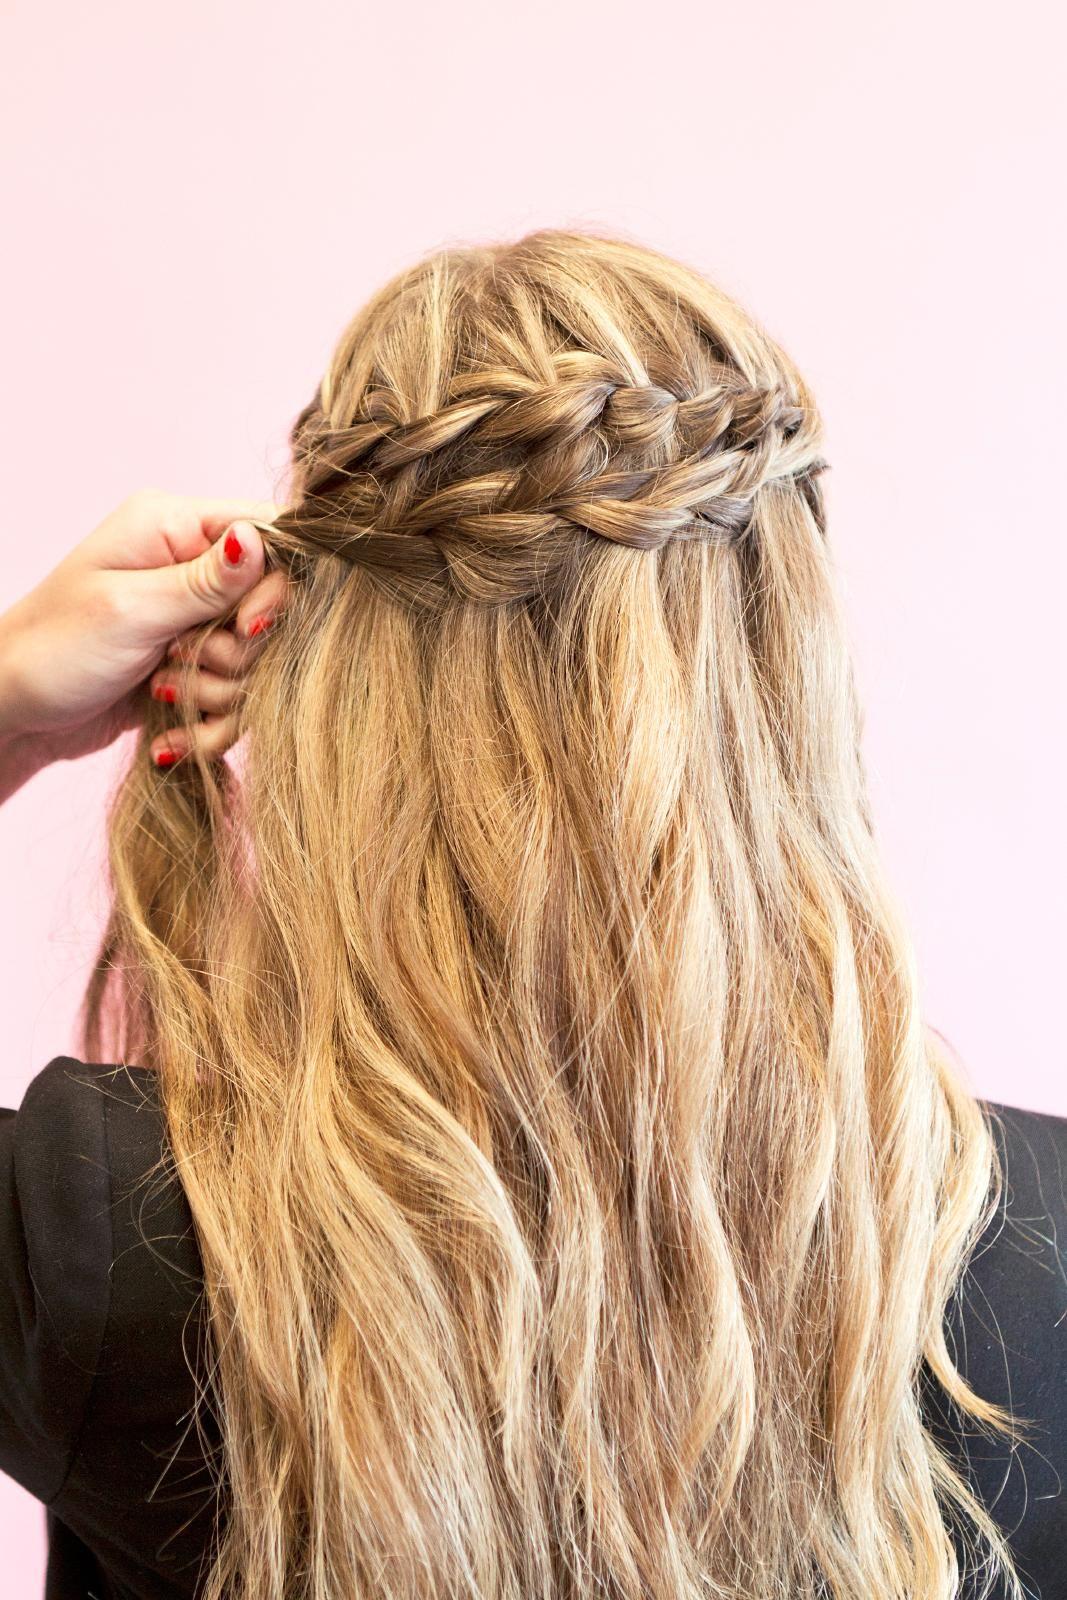 Fun Braids For Bad Hair Days: Genius New Ways To Braid Your Hair